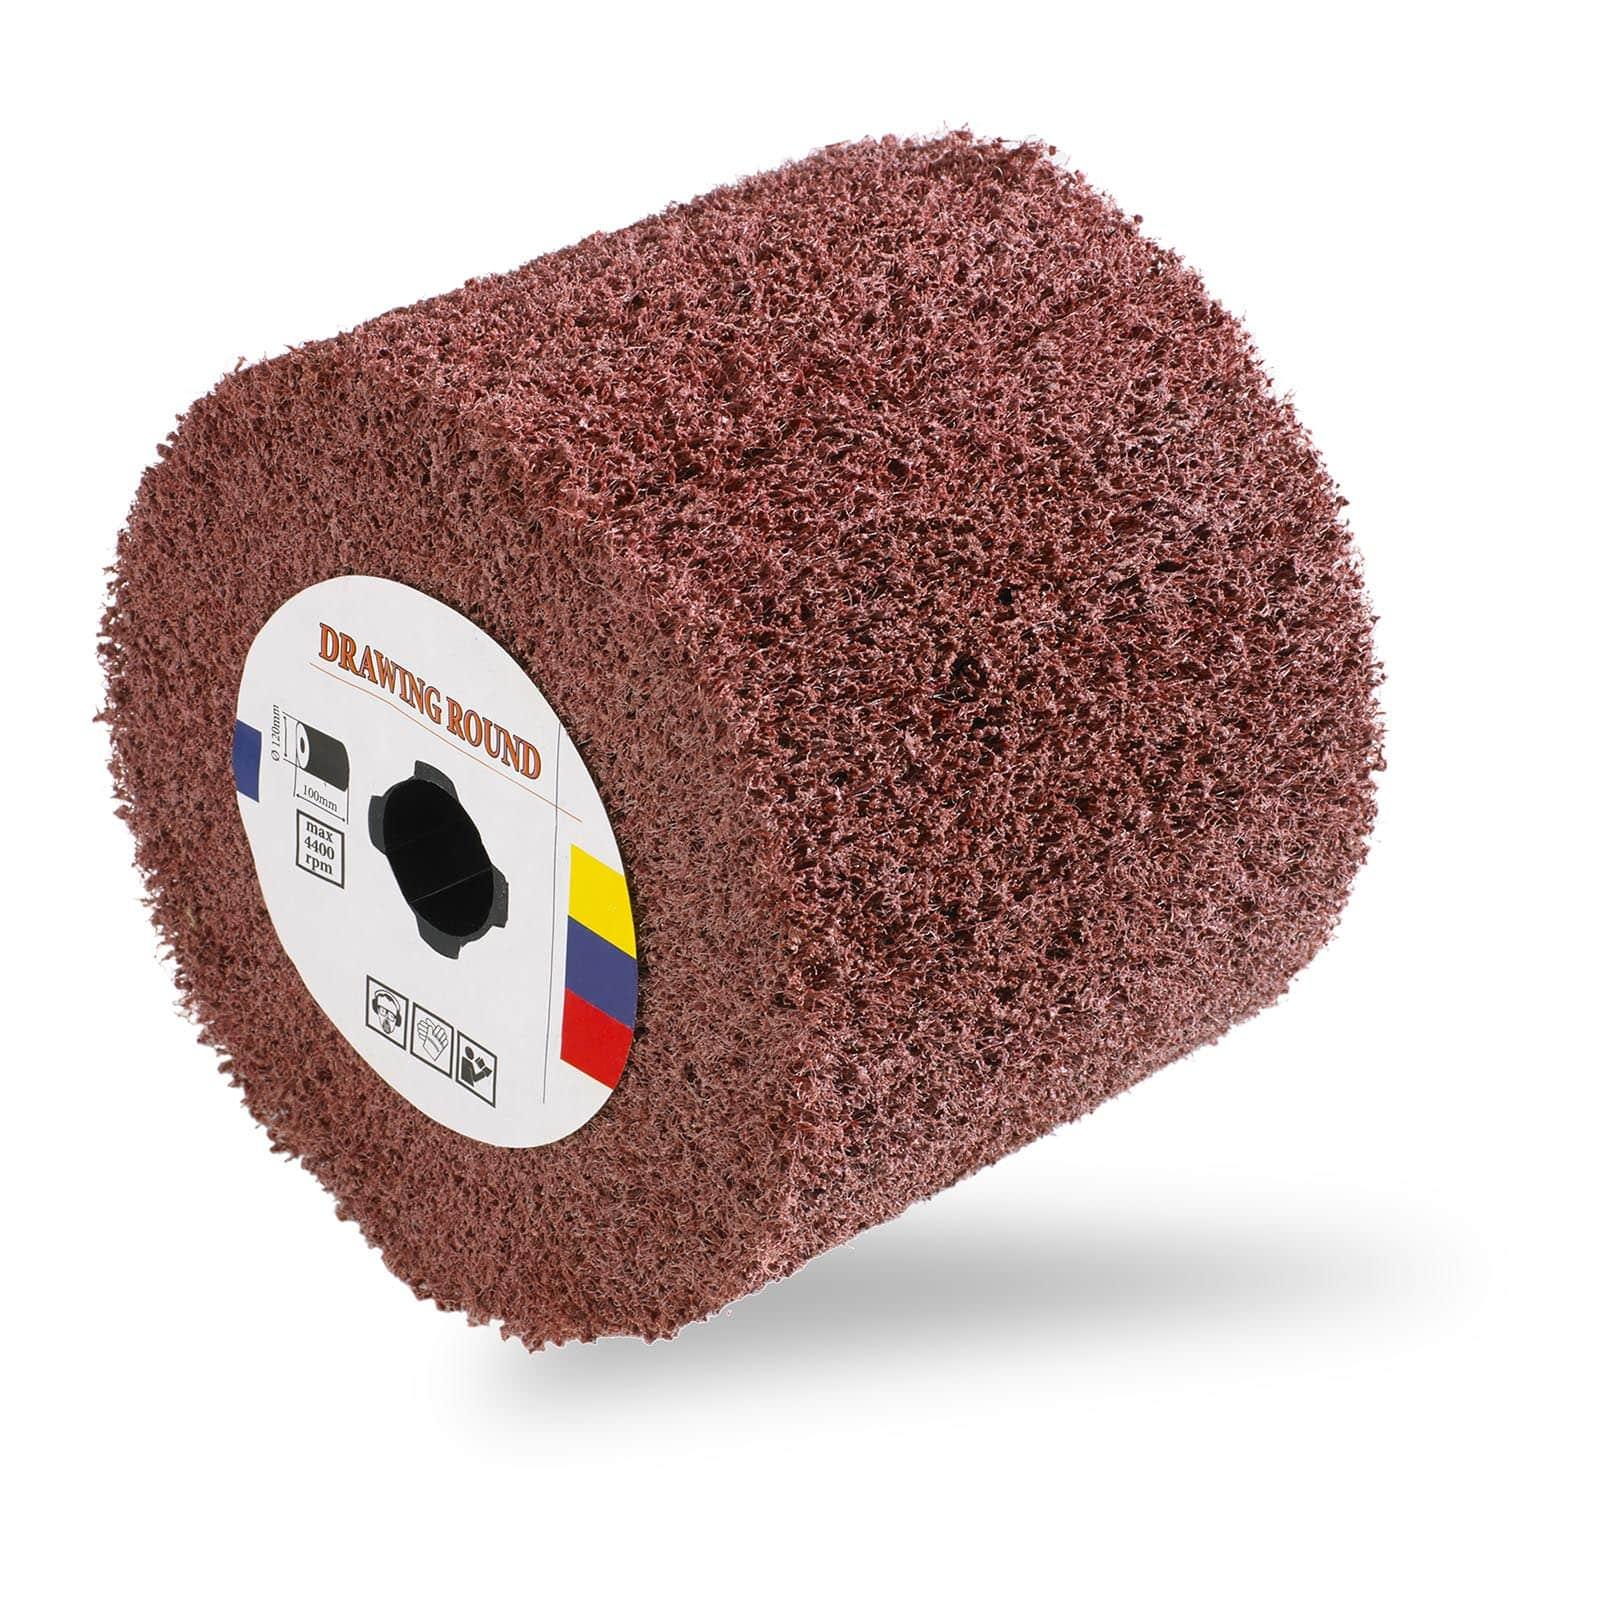 Acessórios para lixar e polir